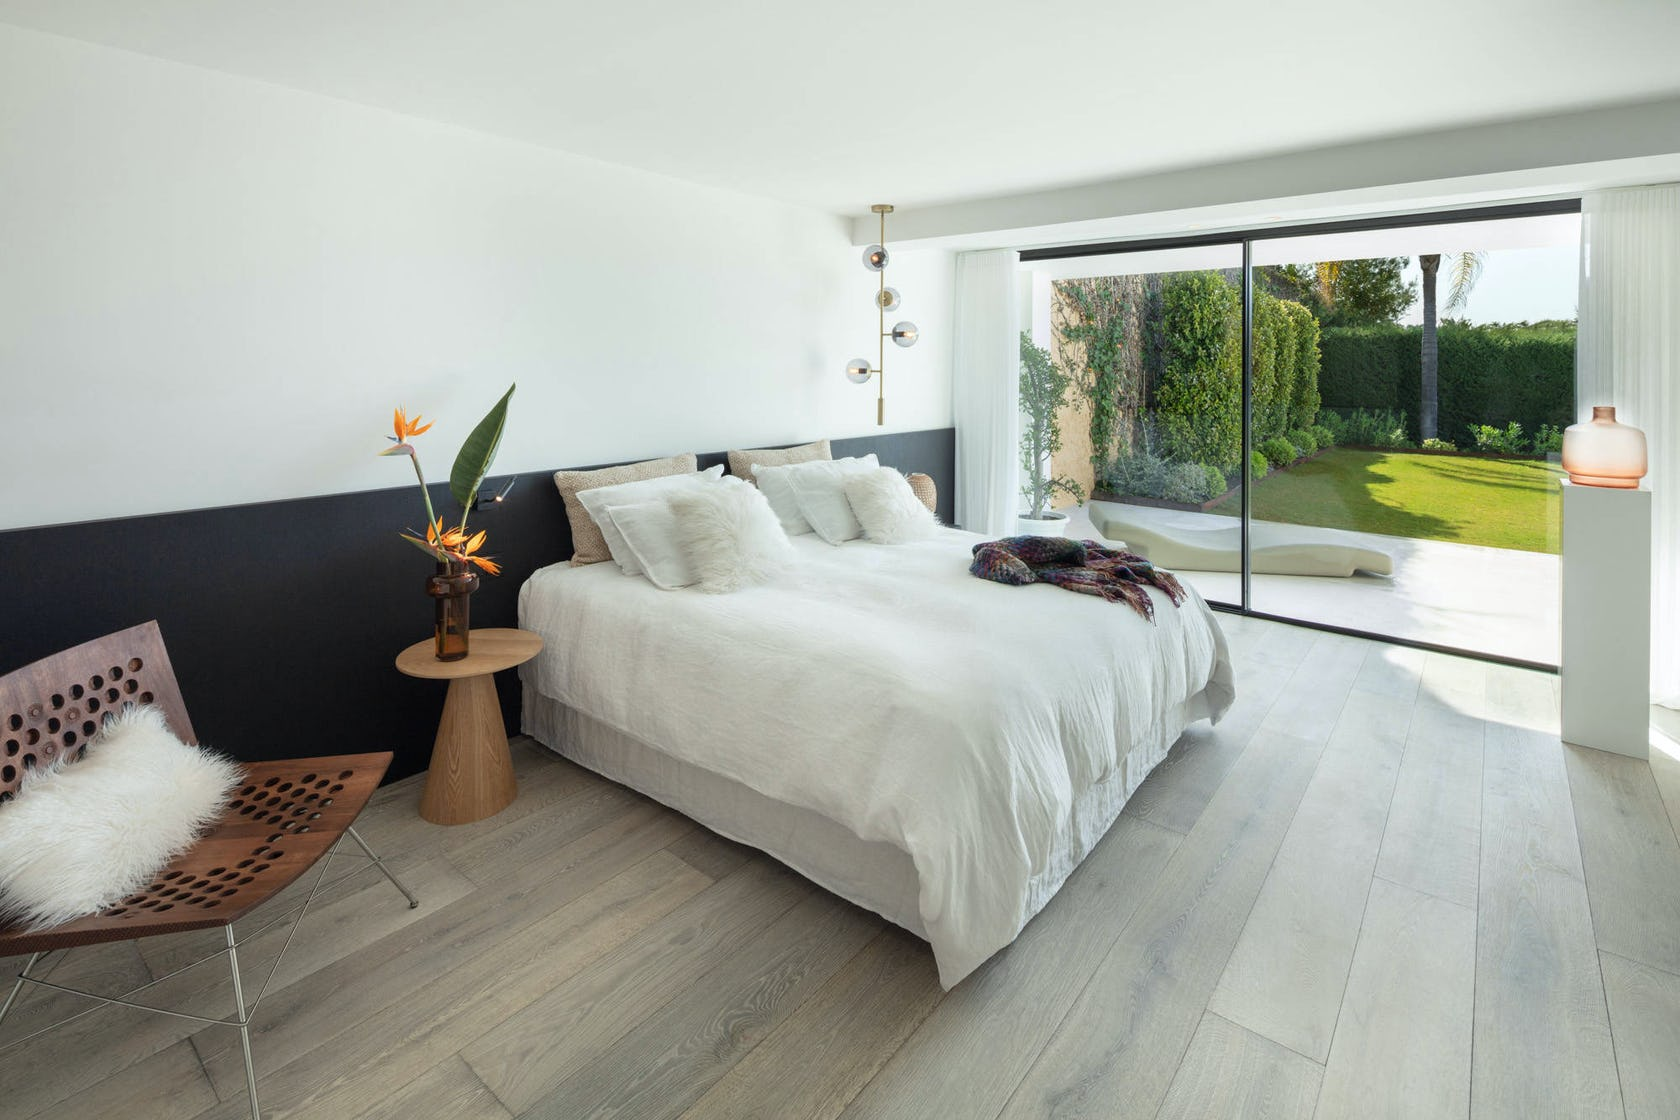 interior design flooring plant ikebana flower arrangement vase flower furniture hardwood wood